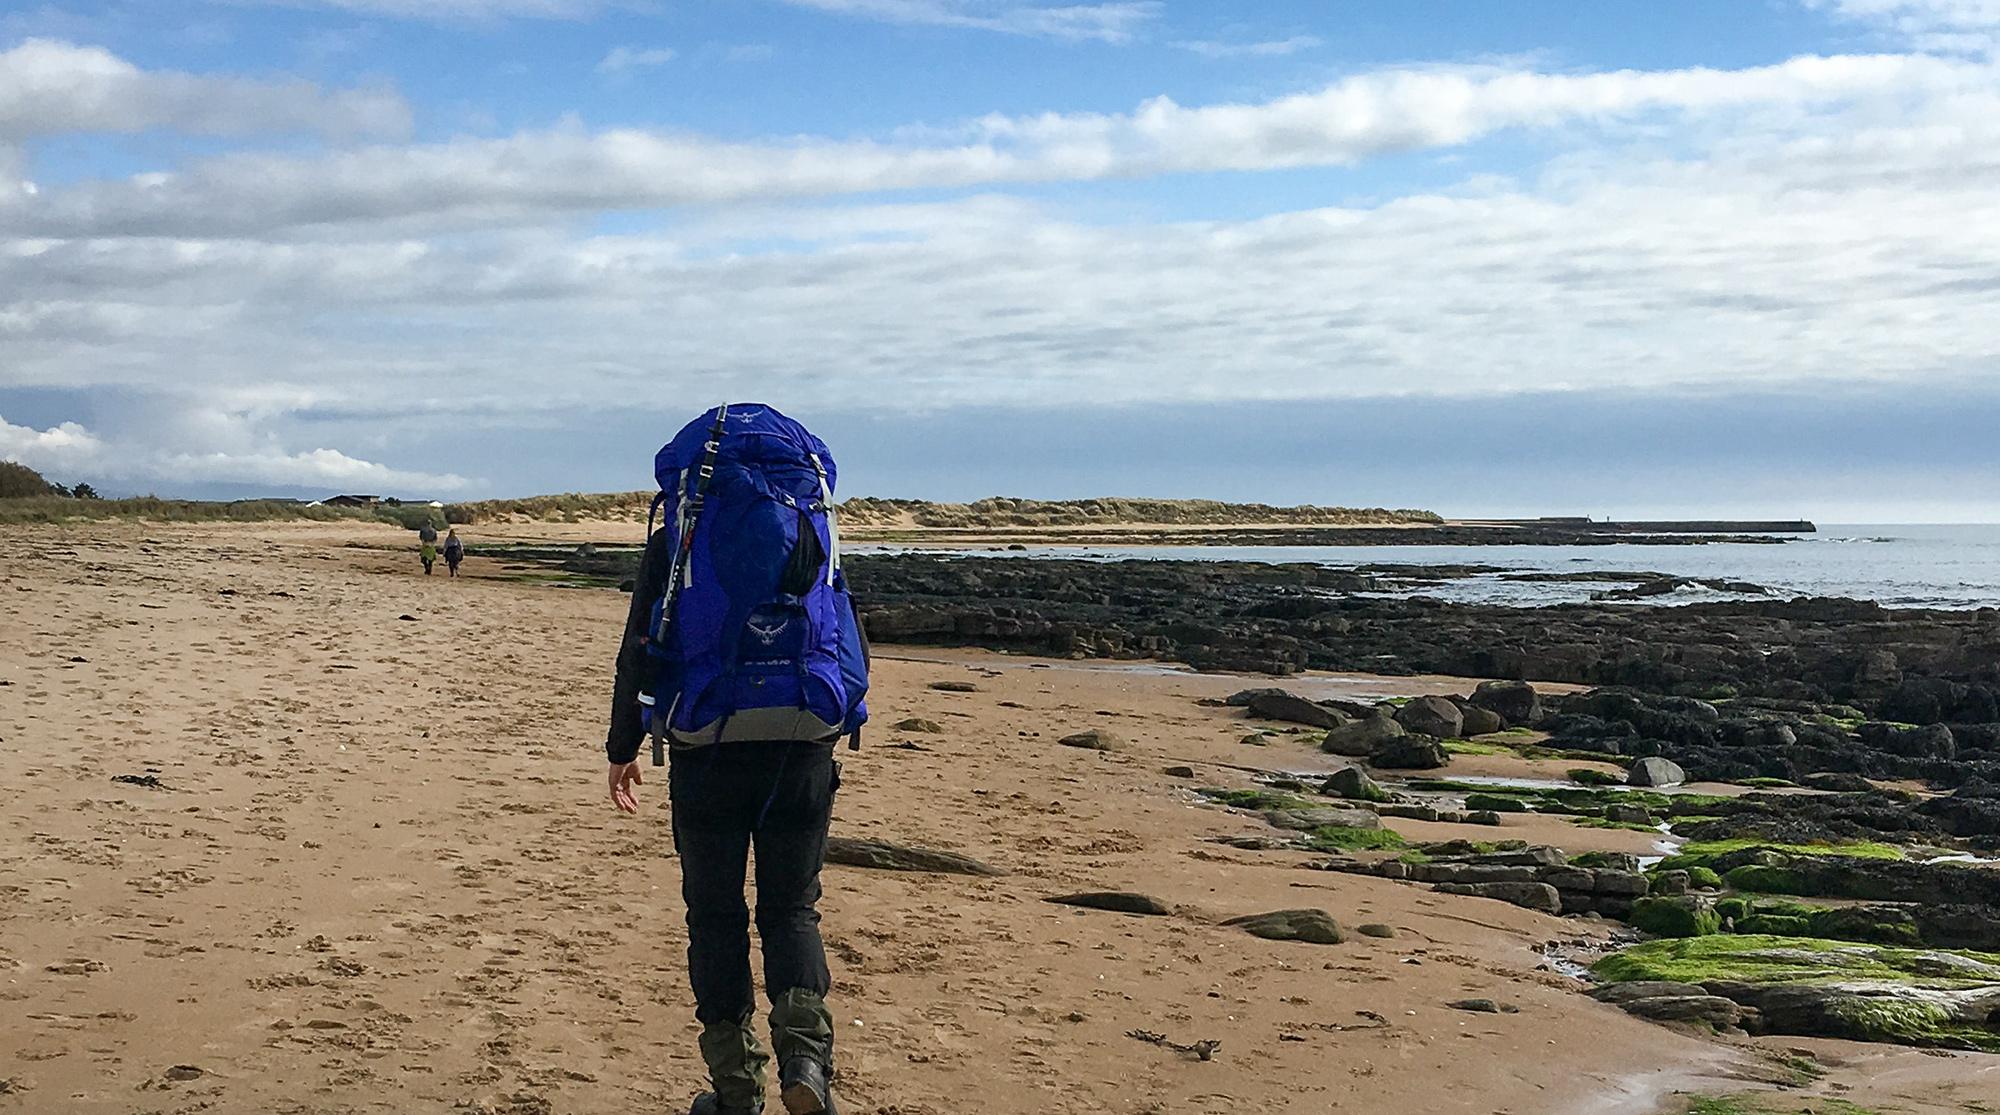 Frau mit Rucksack am strand wandernd